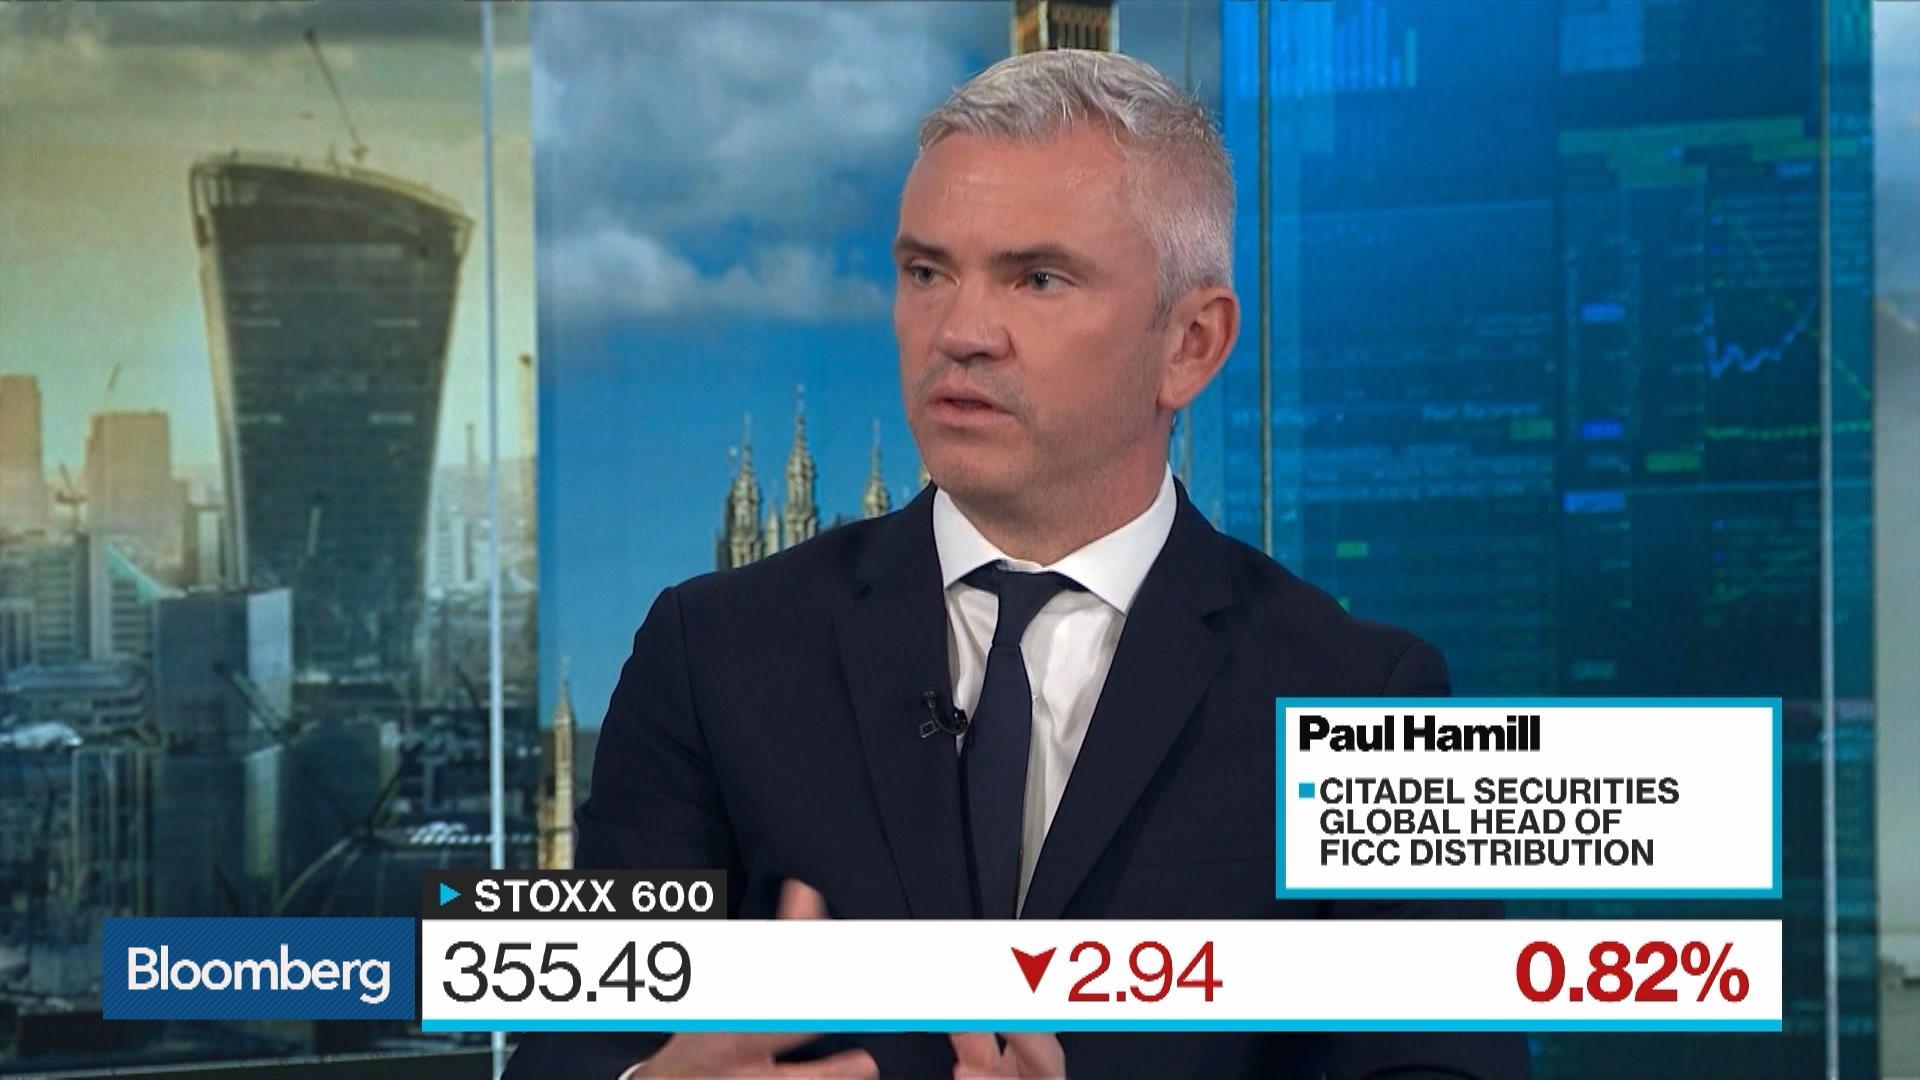 Citadel Securities Sees Fed, Neutral Rate Driving Investors' Concerns